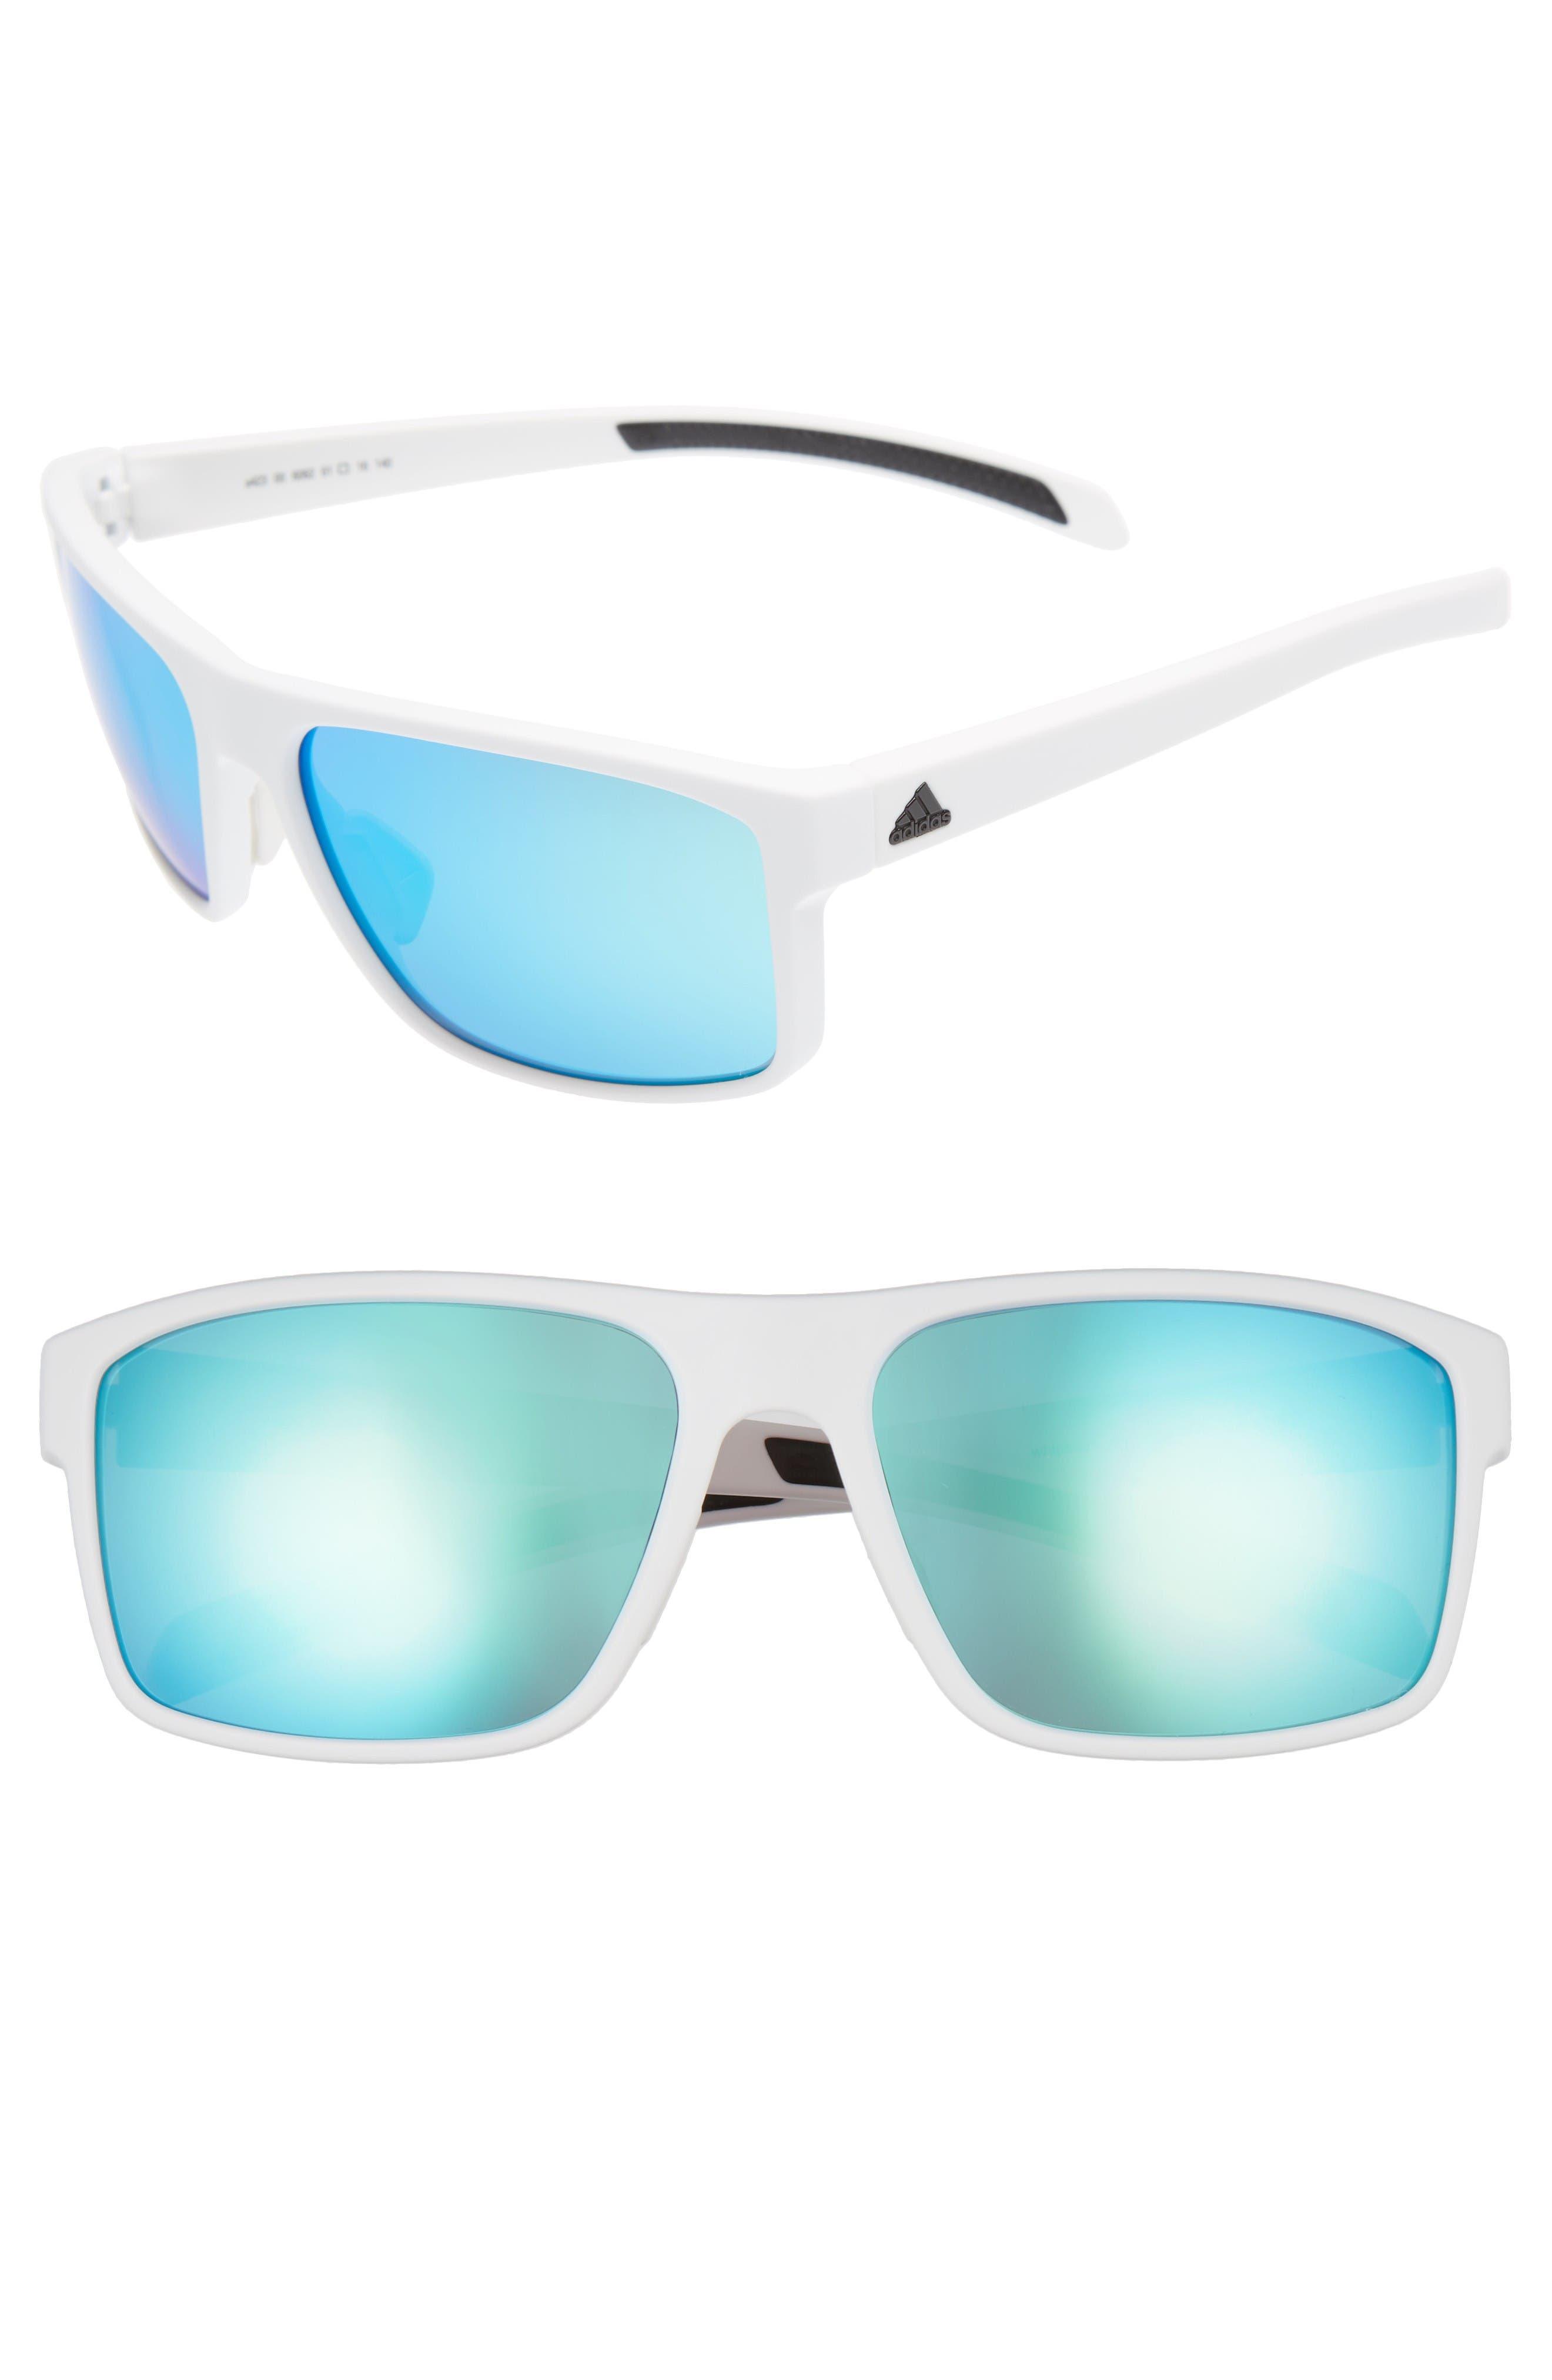 Whipstart 61mm Sunglasses,                             Main thumbnail 1, color,                             White/ Blue Mirror